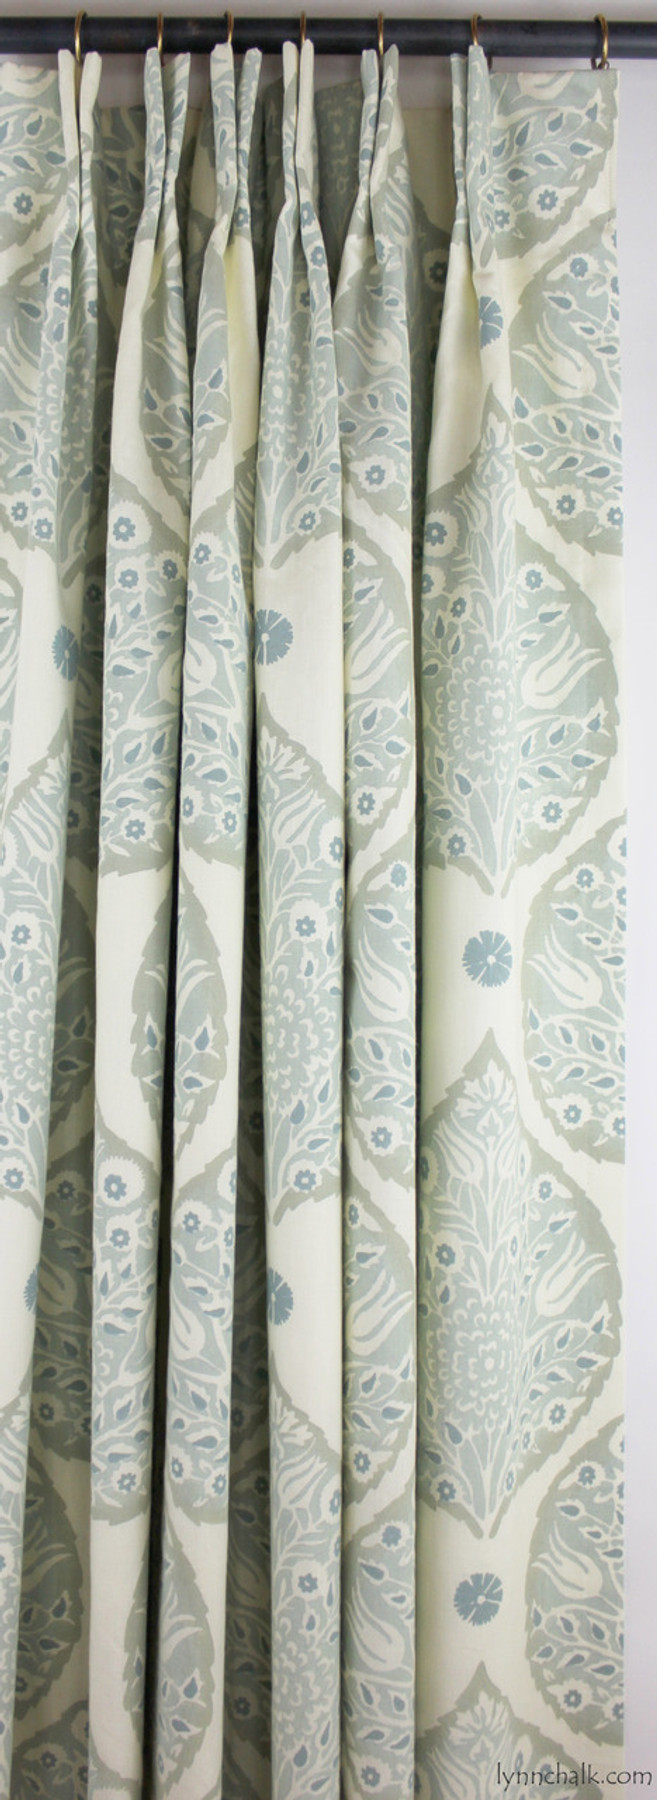 Custom Drapes in Lotus Mineral on Cream Linen